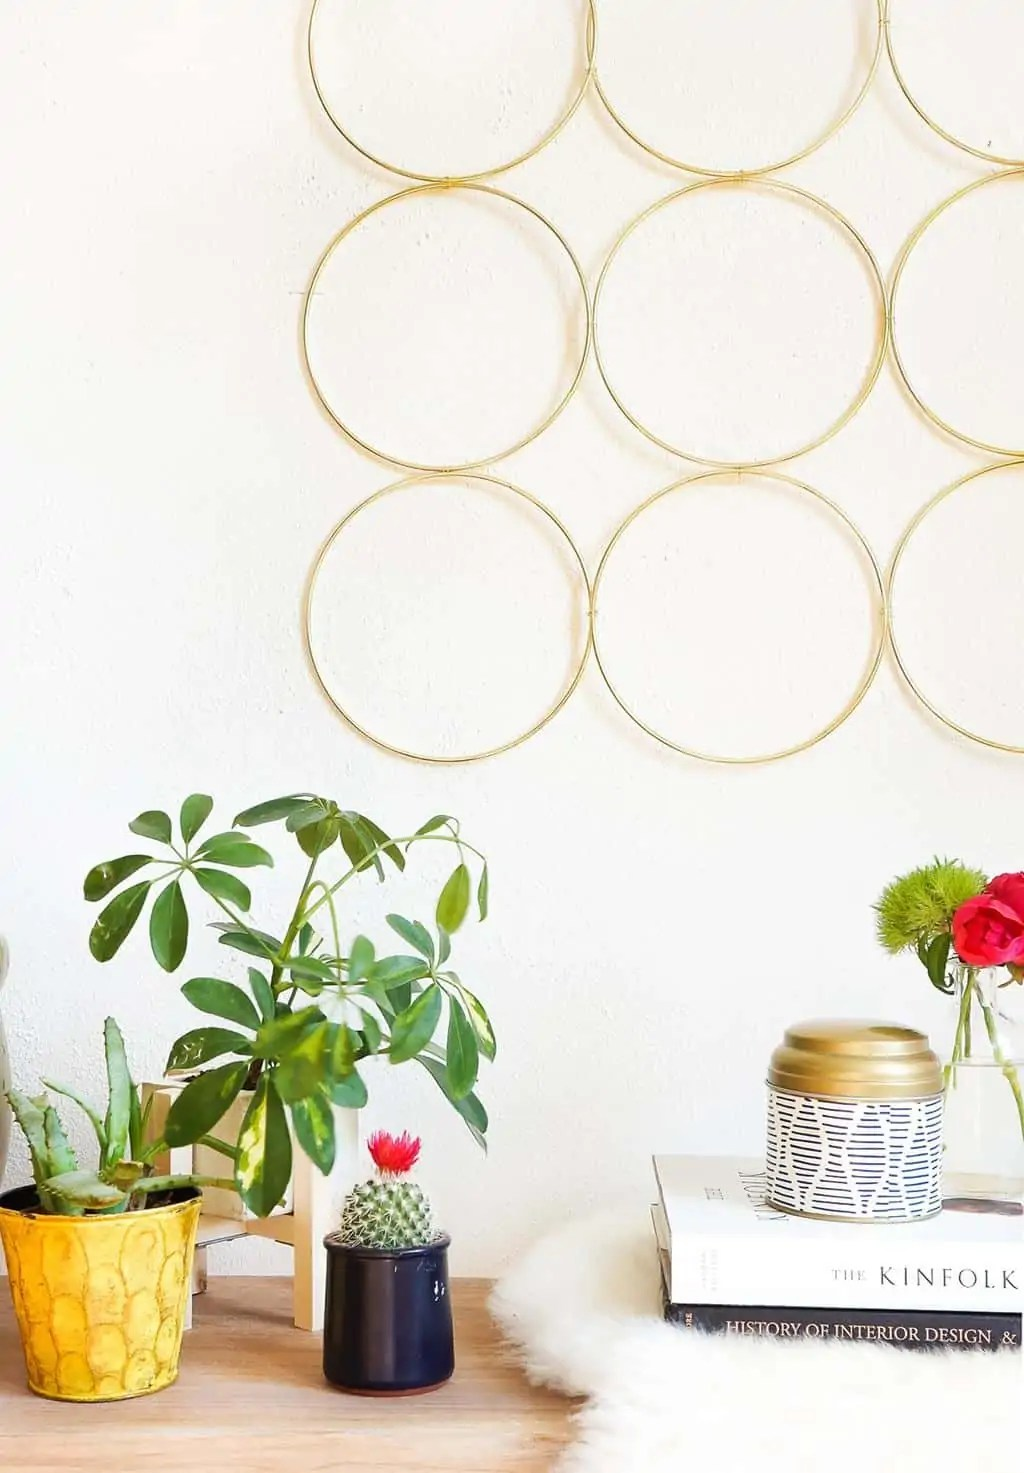 Fullsize Of Diy Decorations For Home